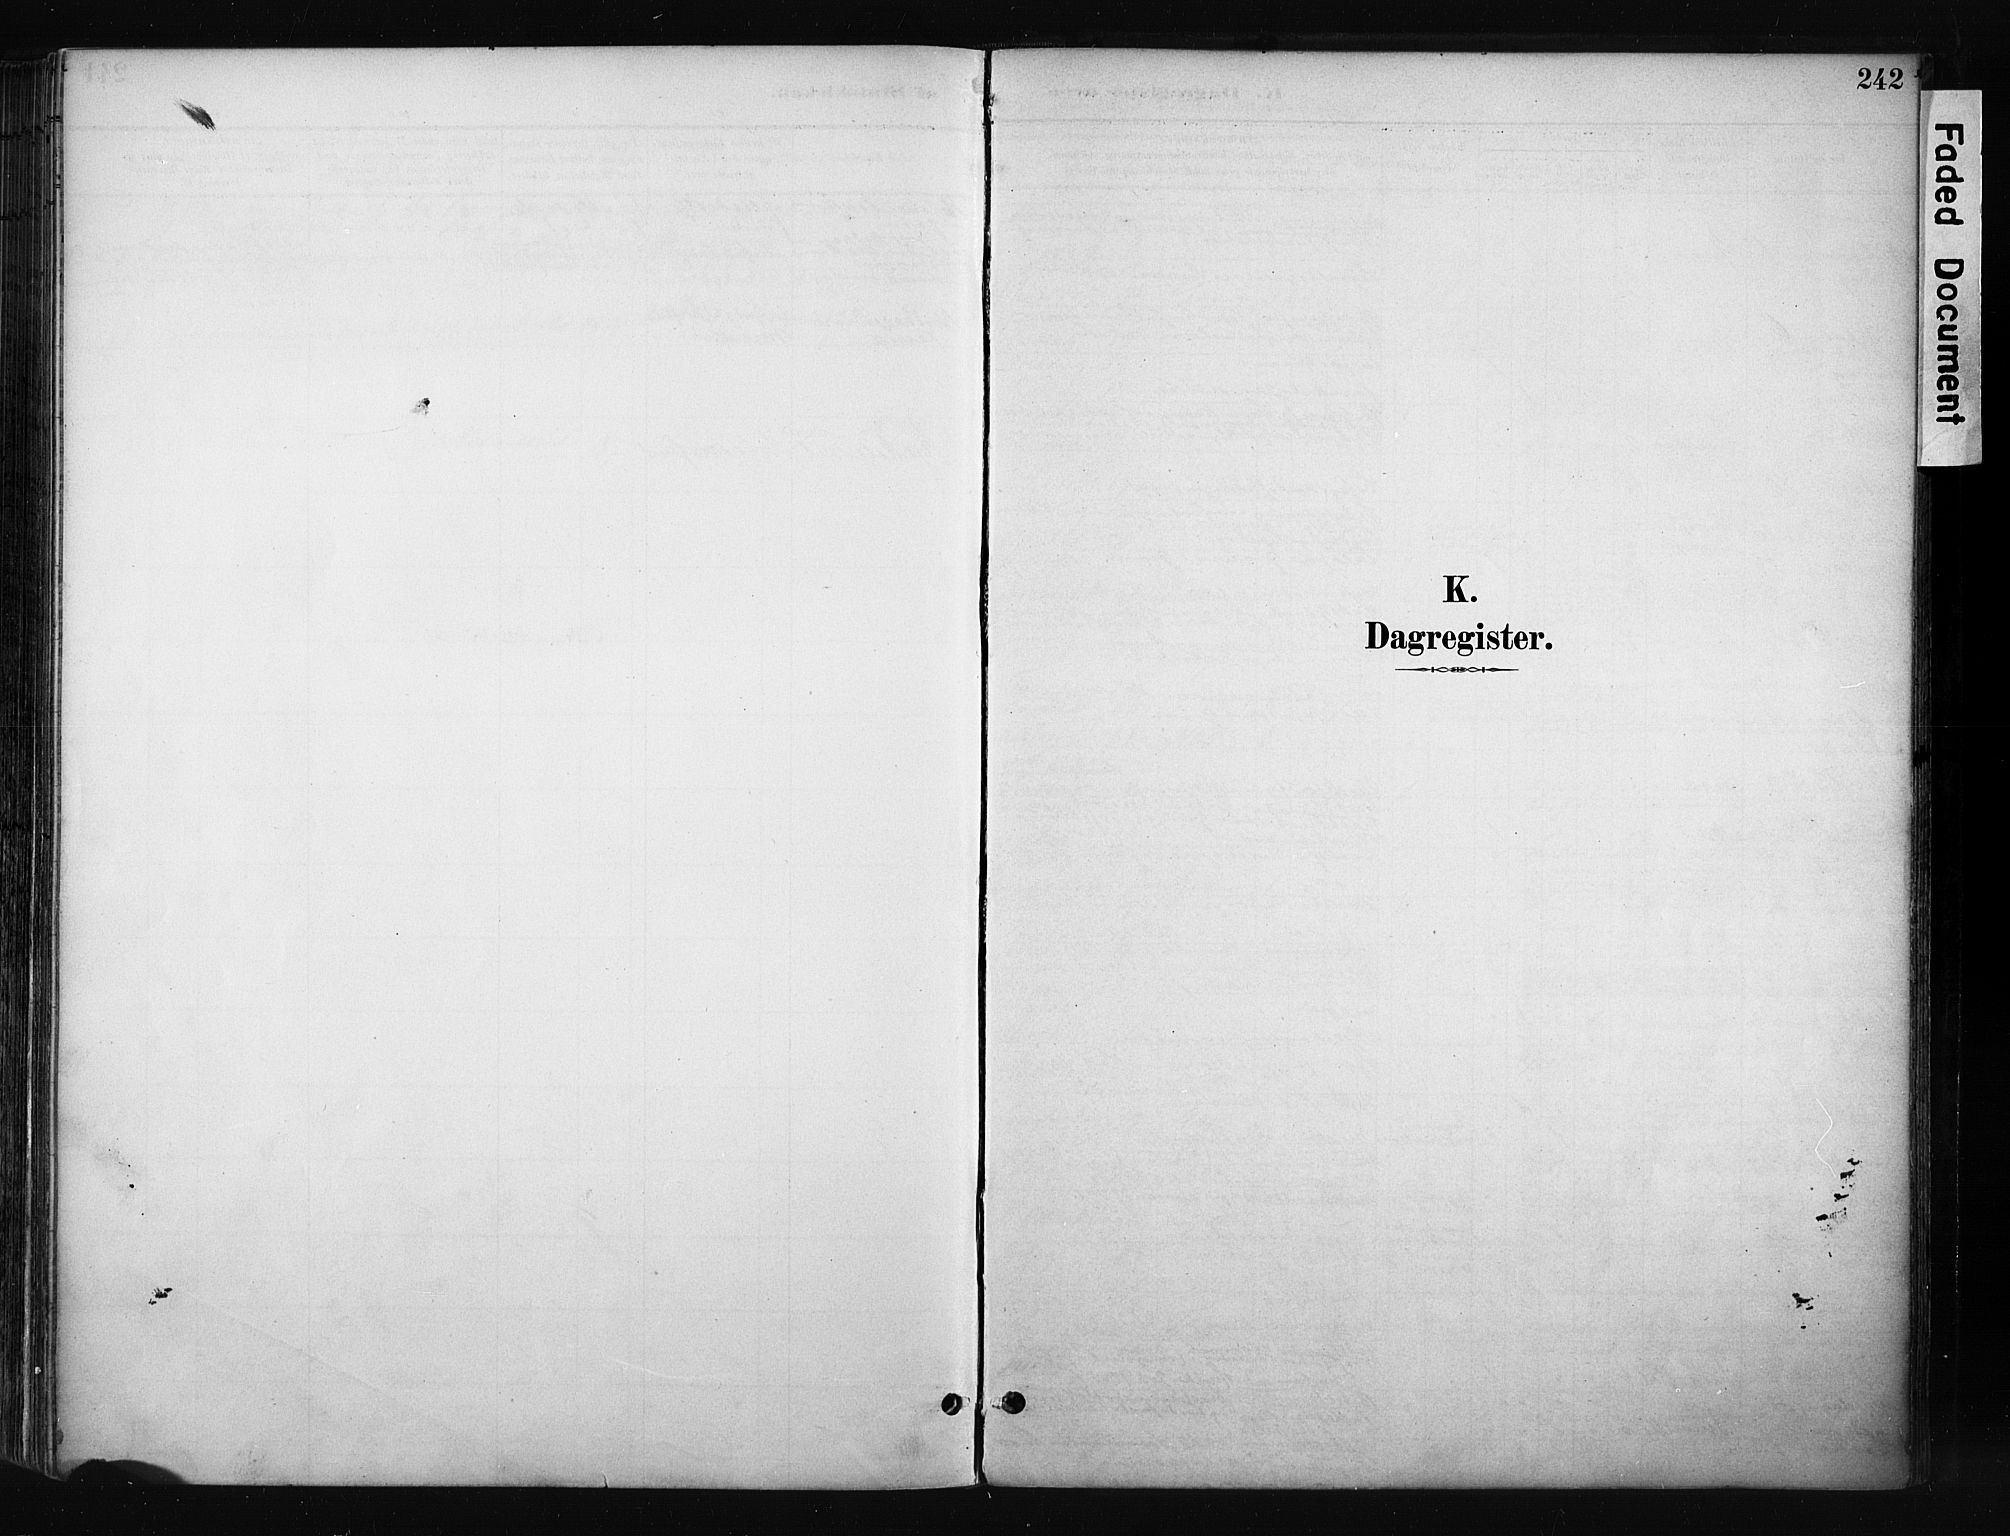 SAH, Gran prestekontor, Ministerialbok nr. 17, 1889-1897, s. 242